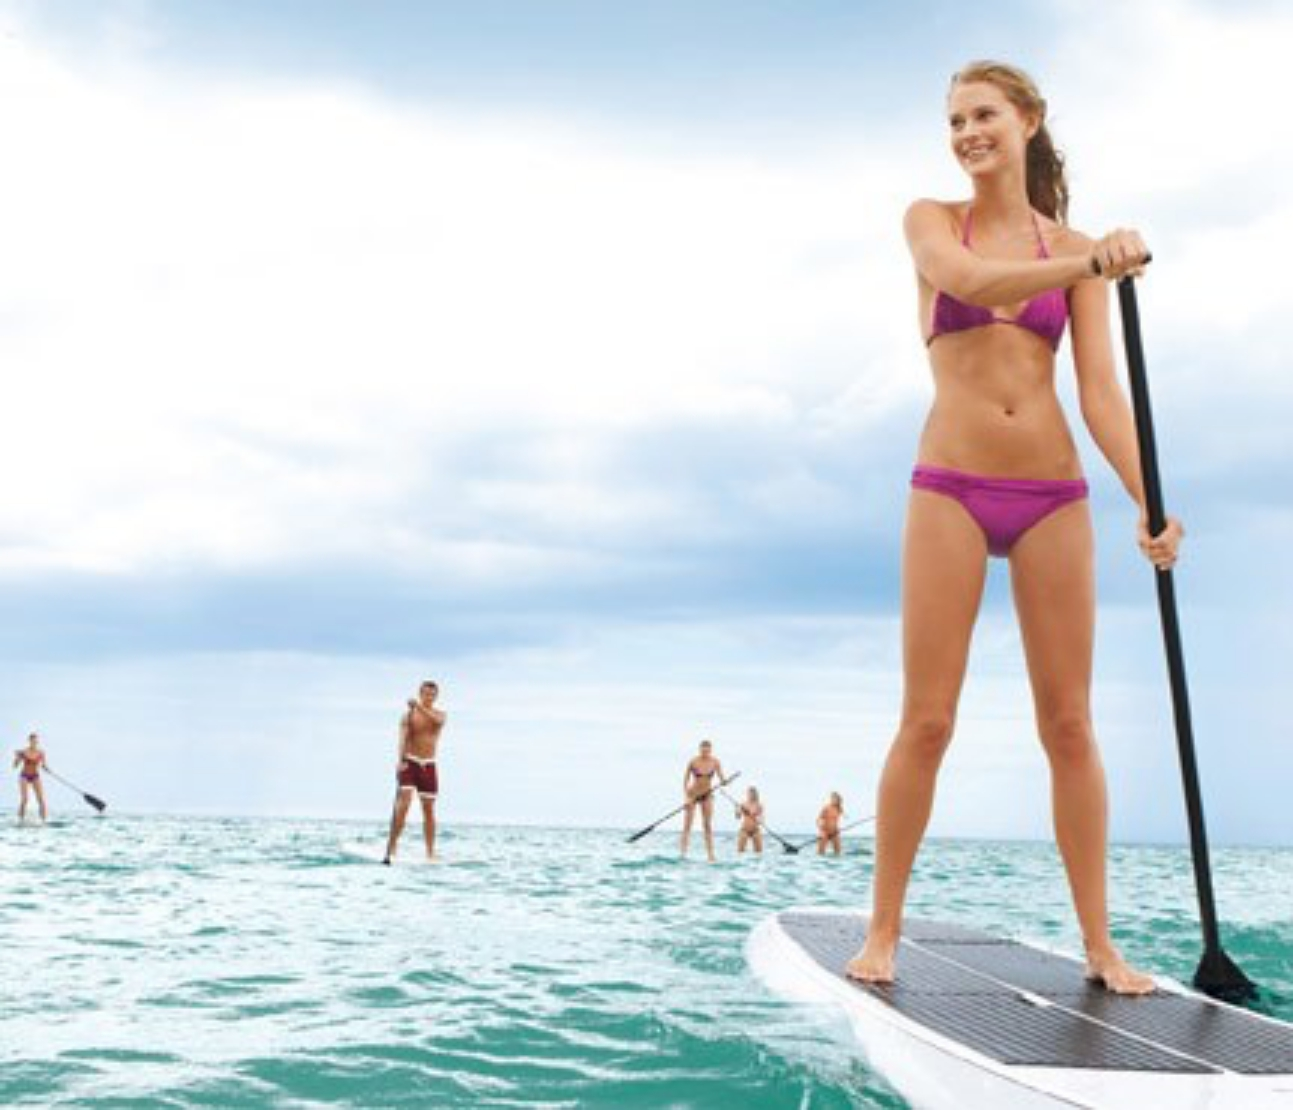 paddleboarding-14-fiss431